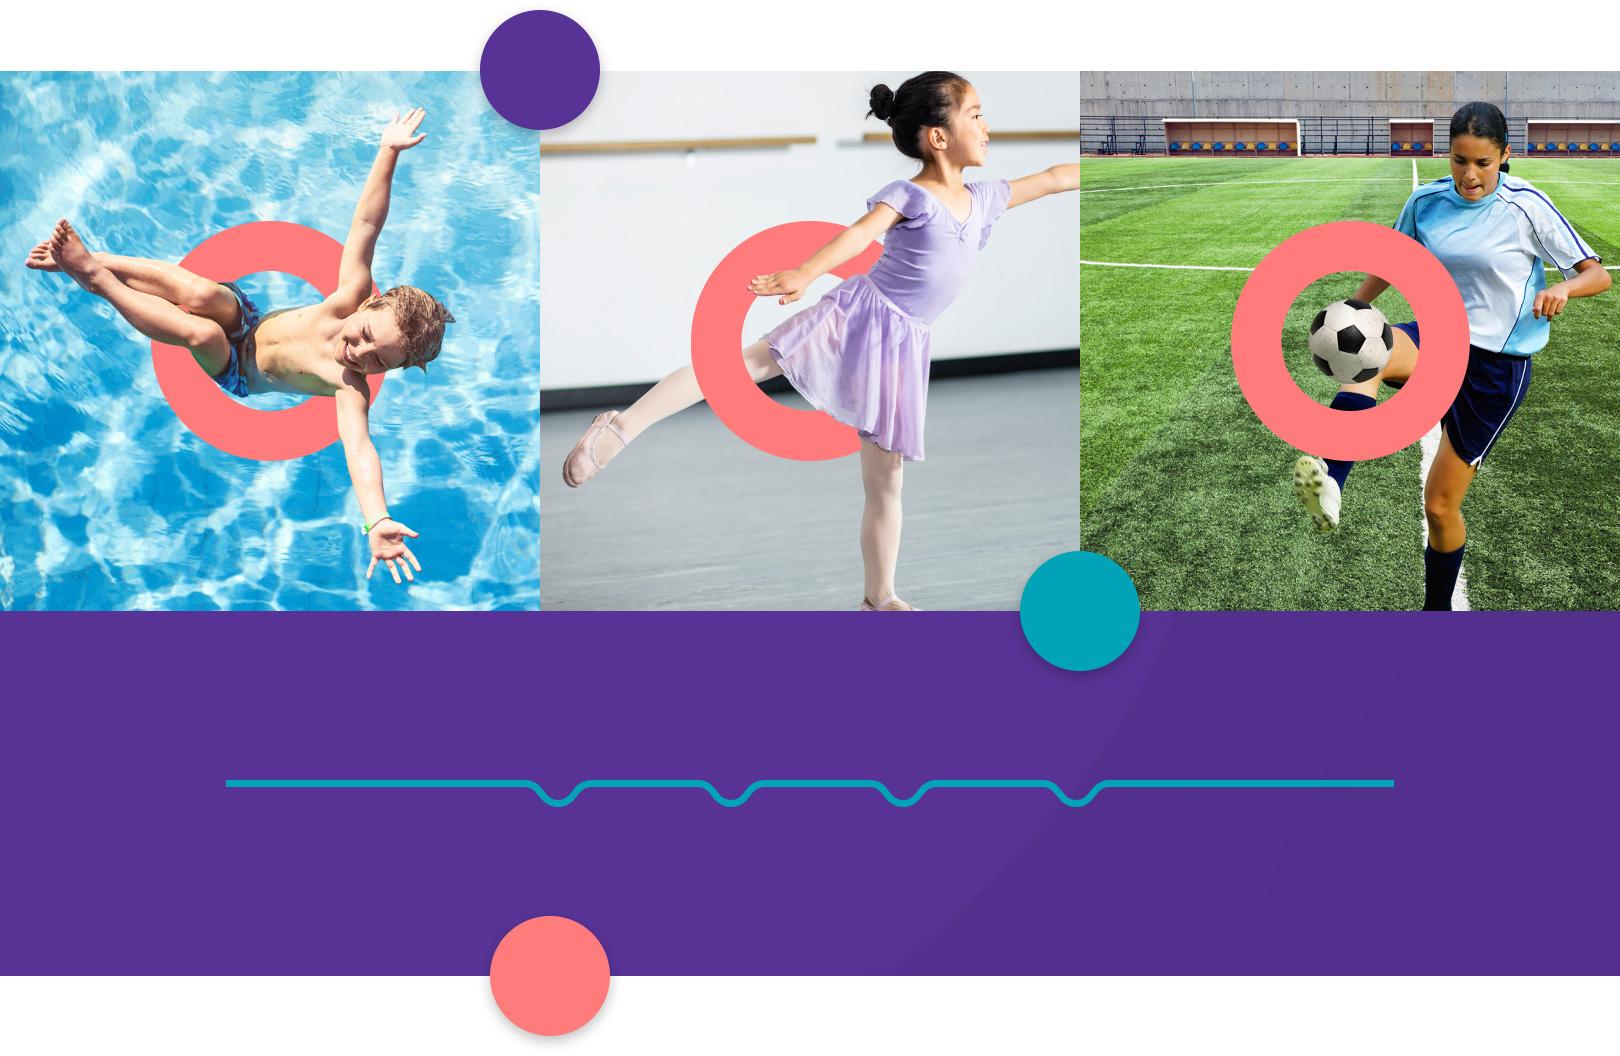 Epilepsy Foundation Brand Elements